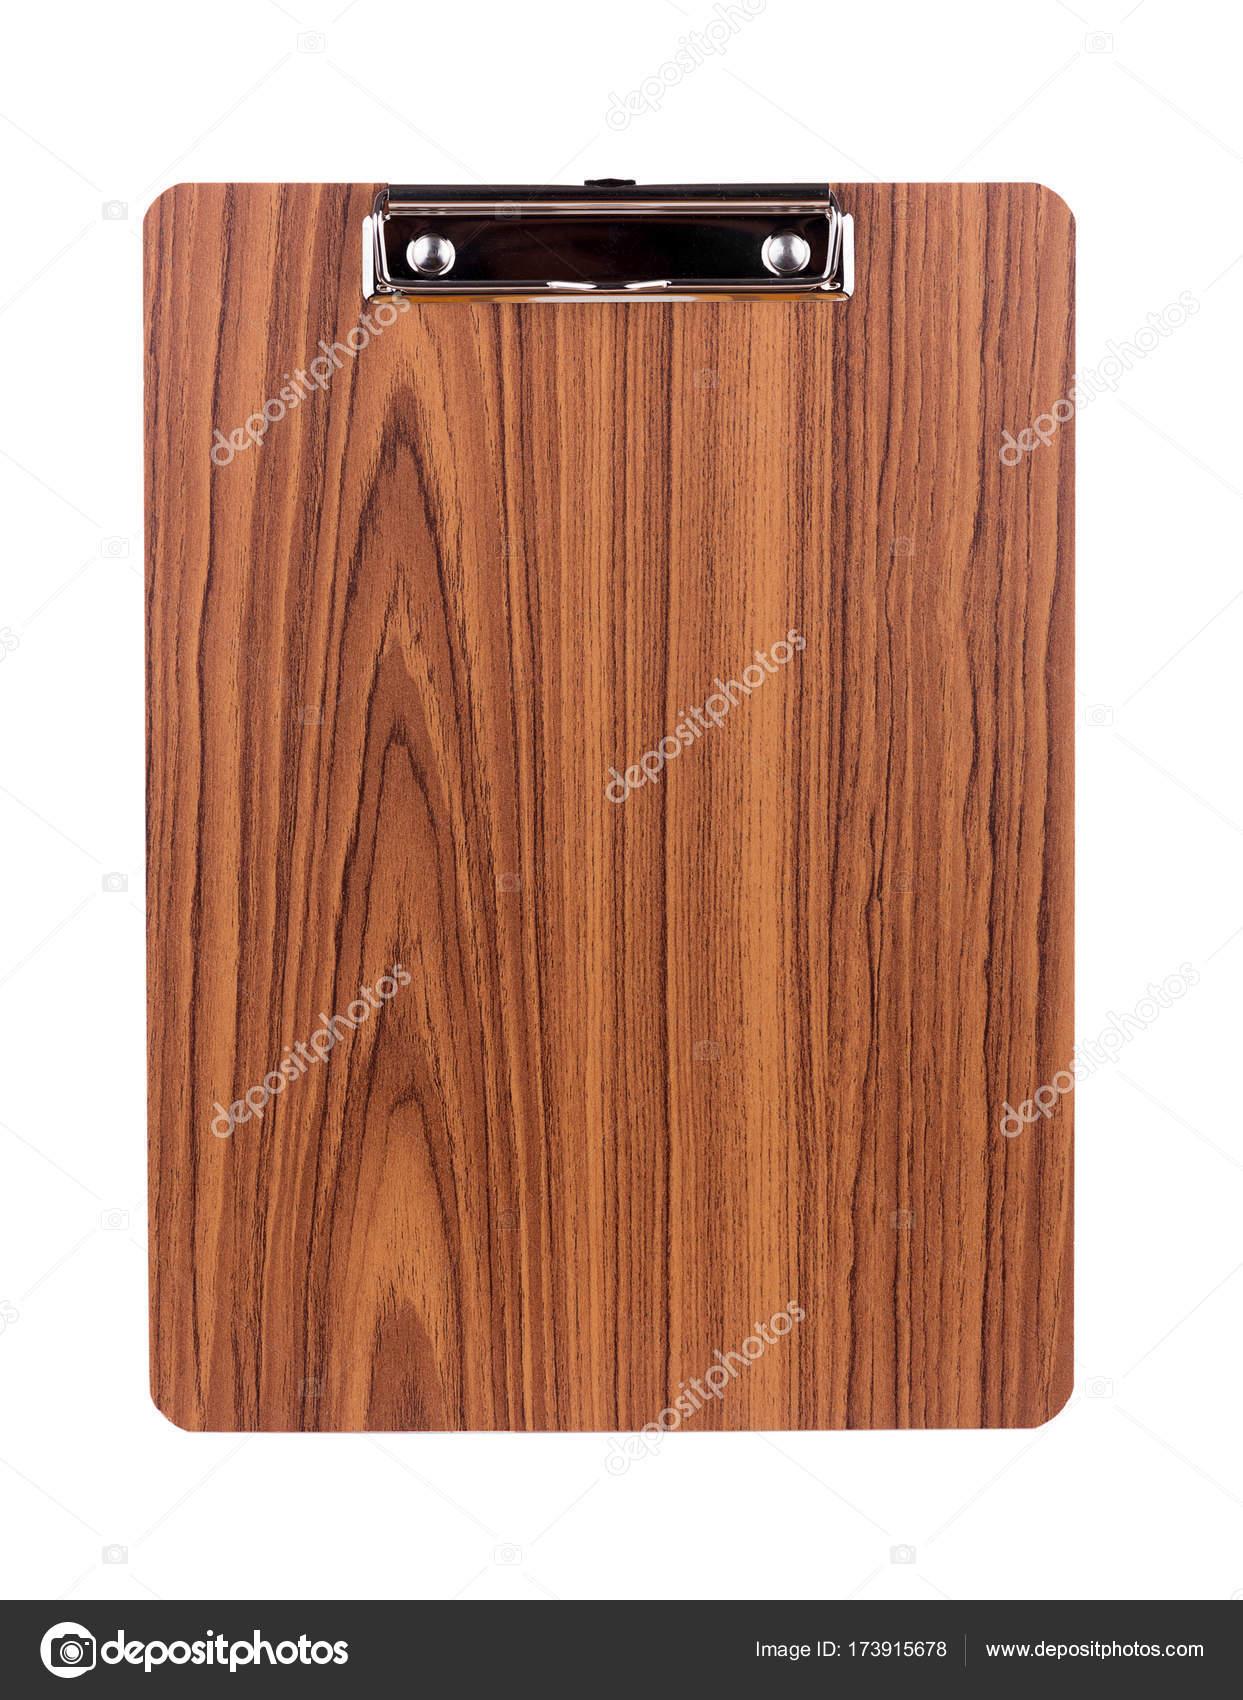 wooden clipboard on white background stock photo nortongo 173915678